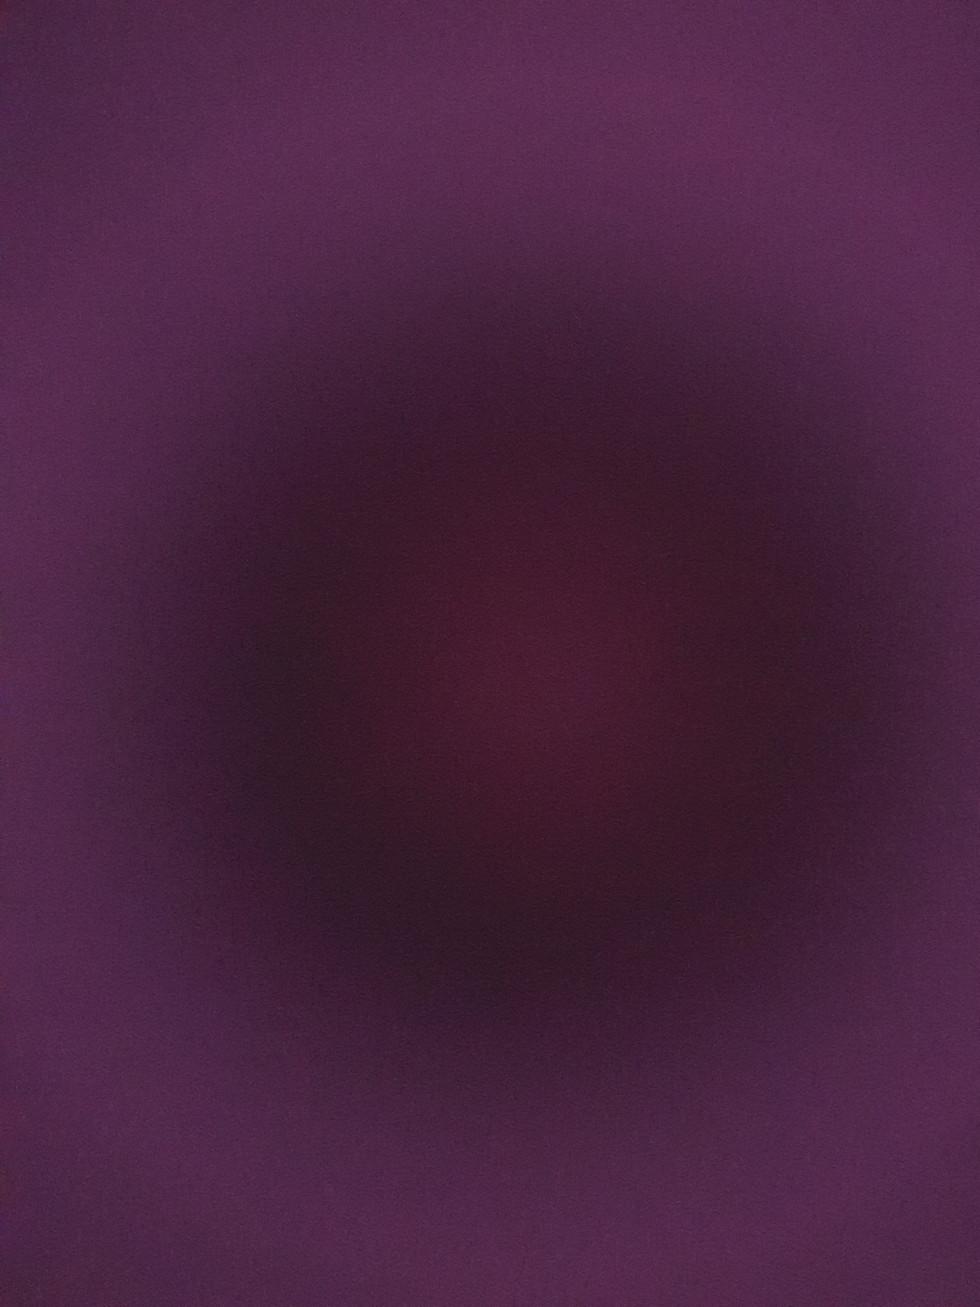 AleDima purple rain 20200517.jpg